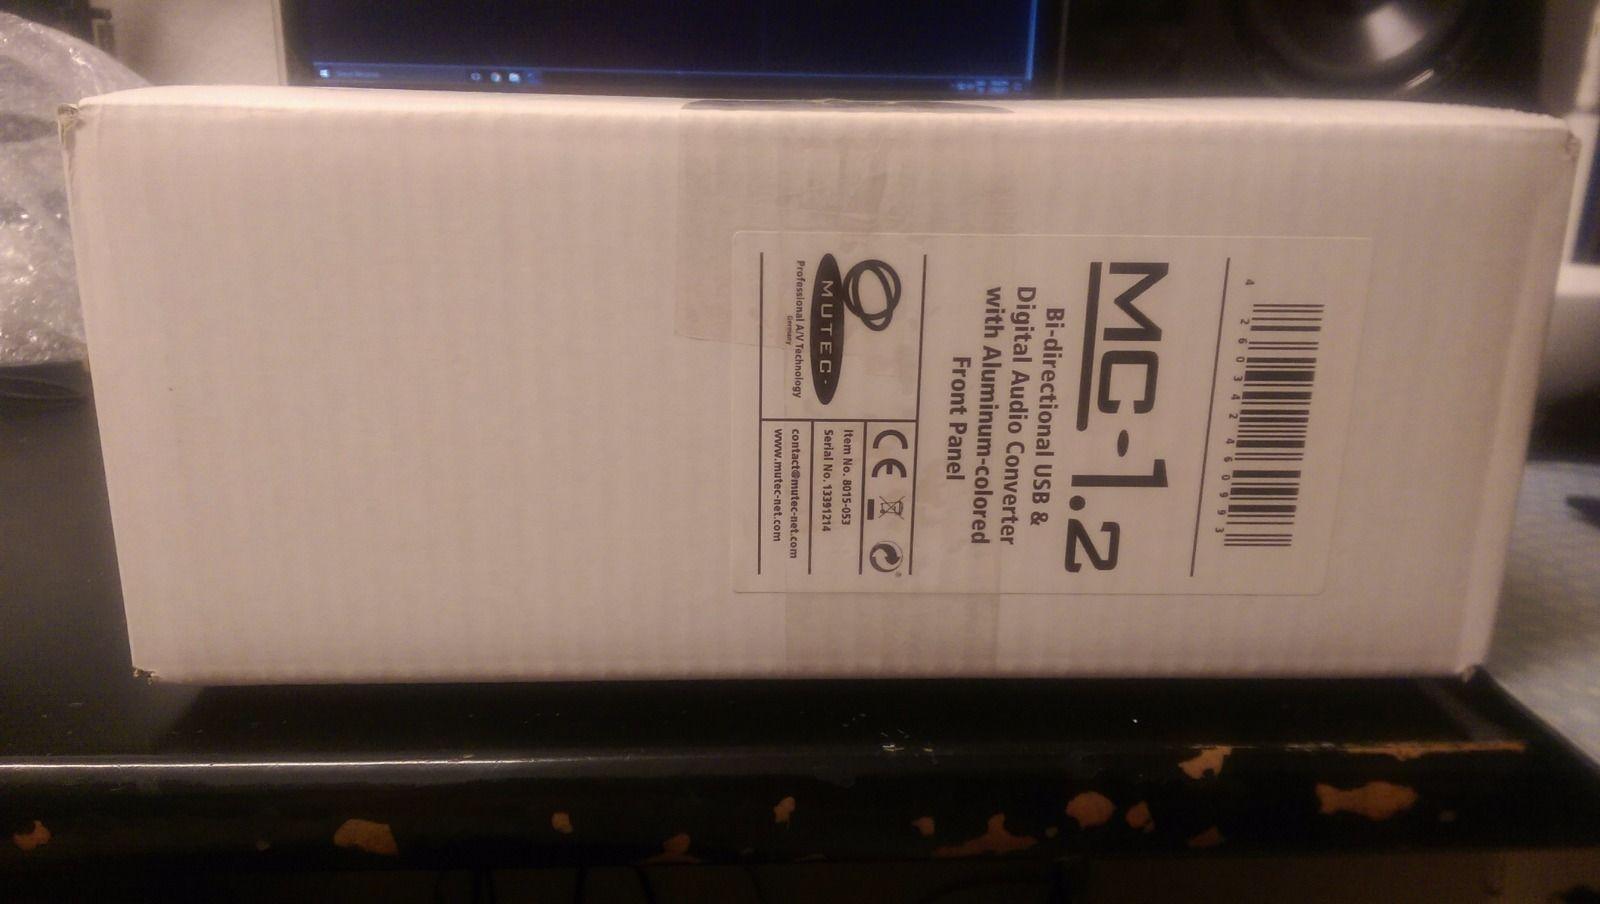 mutec mc 3 usb manual